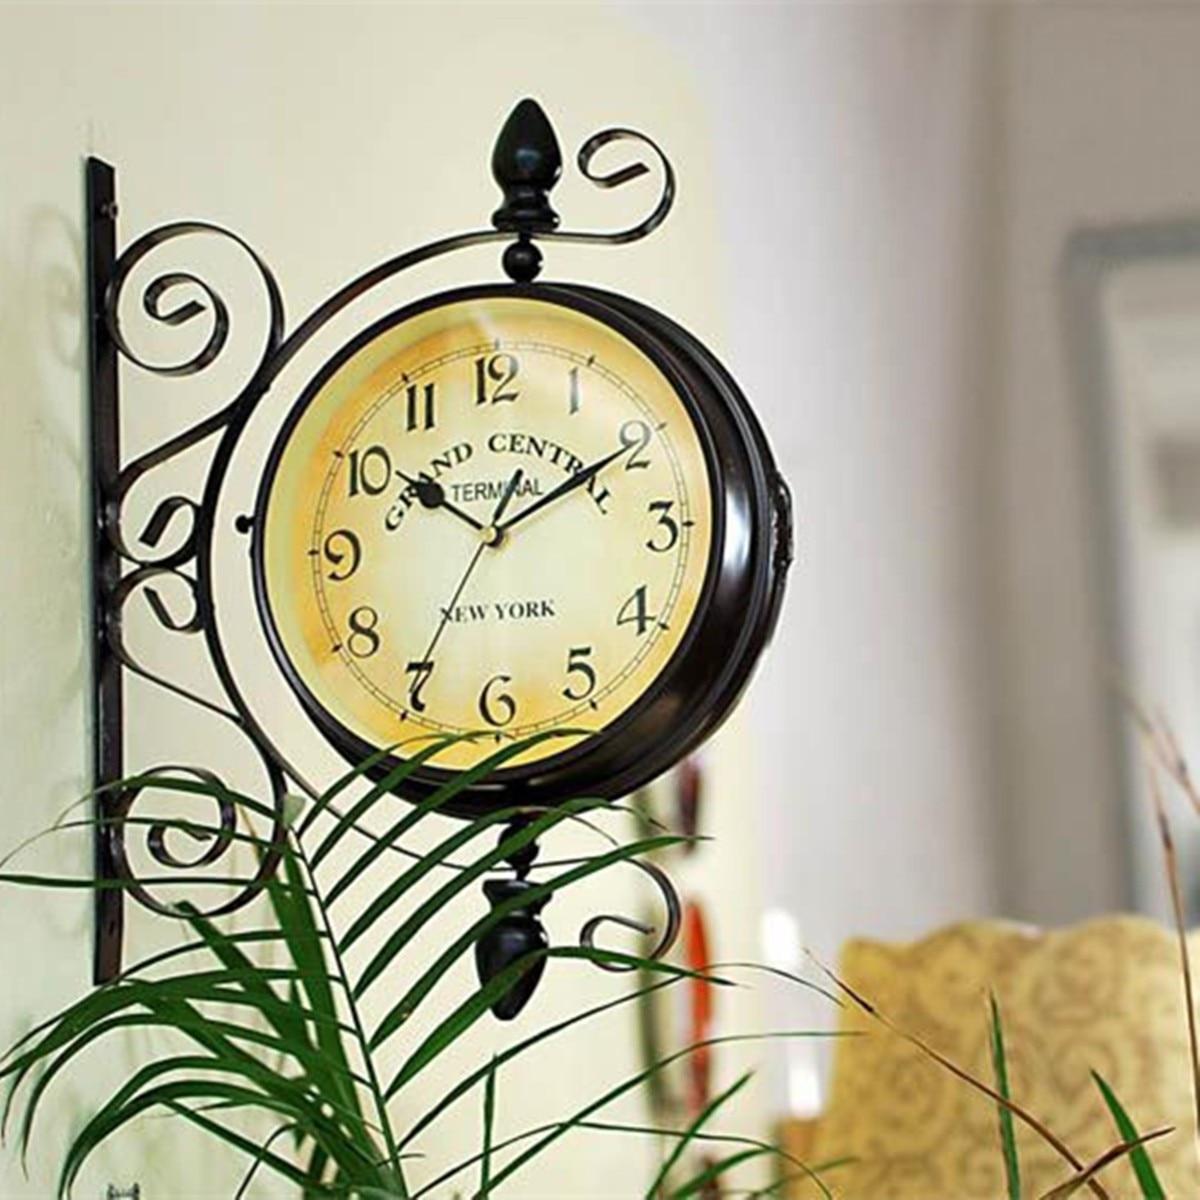 Retro Double Side Rotating Wall Clock Metal Hanging Clock Outdoor Home Garden Decor European Clock Gift